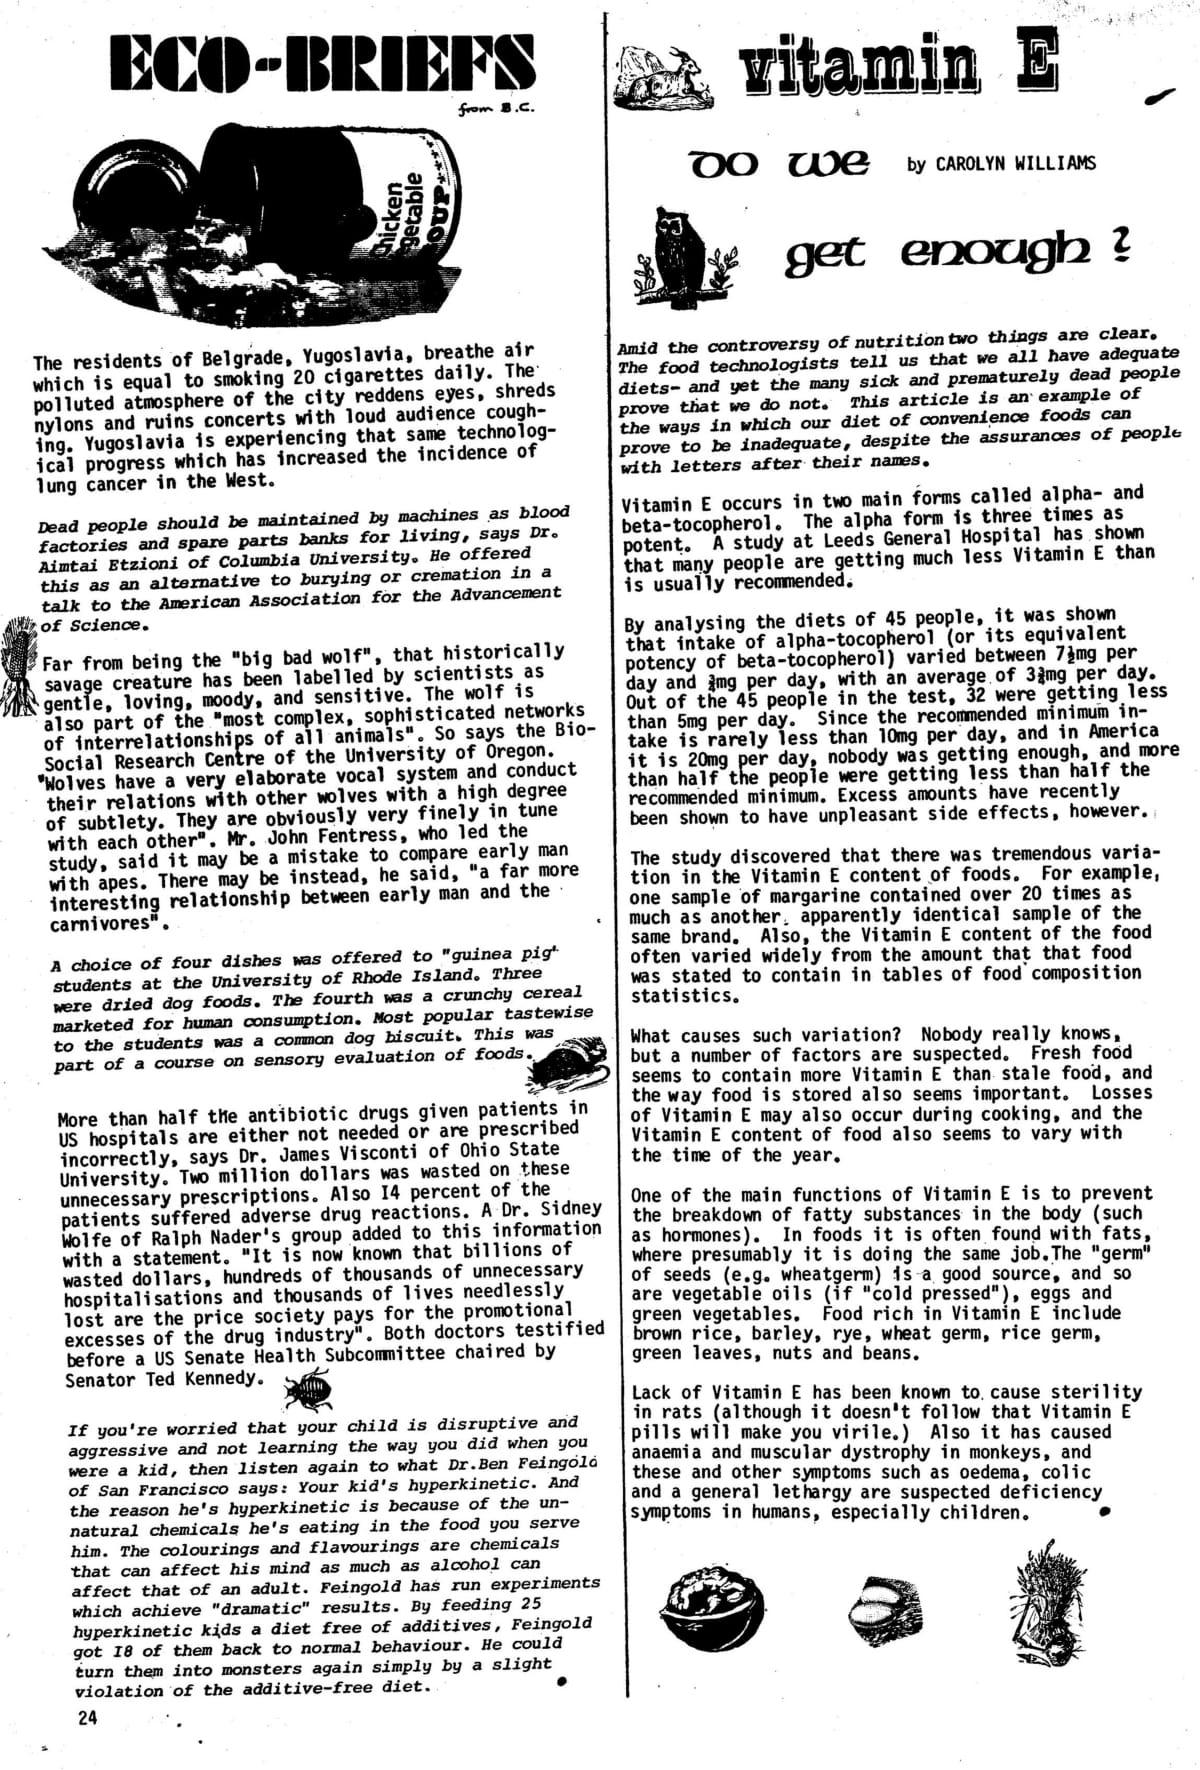 seed-v3-n4-april1974-24.jpg